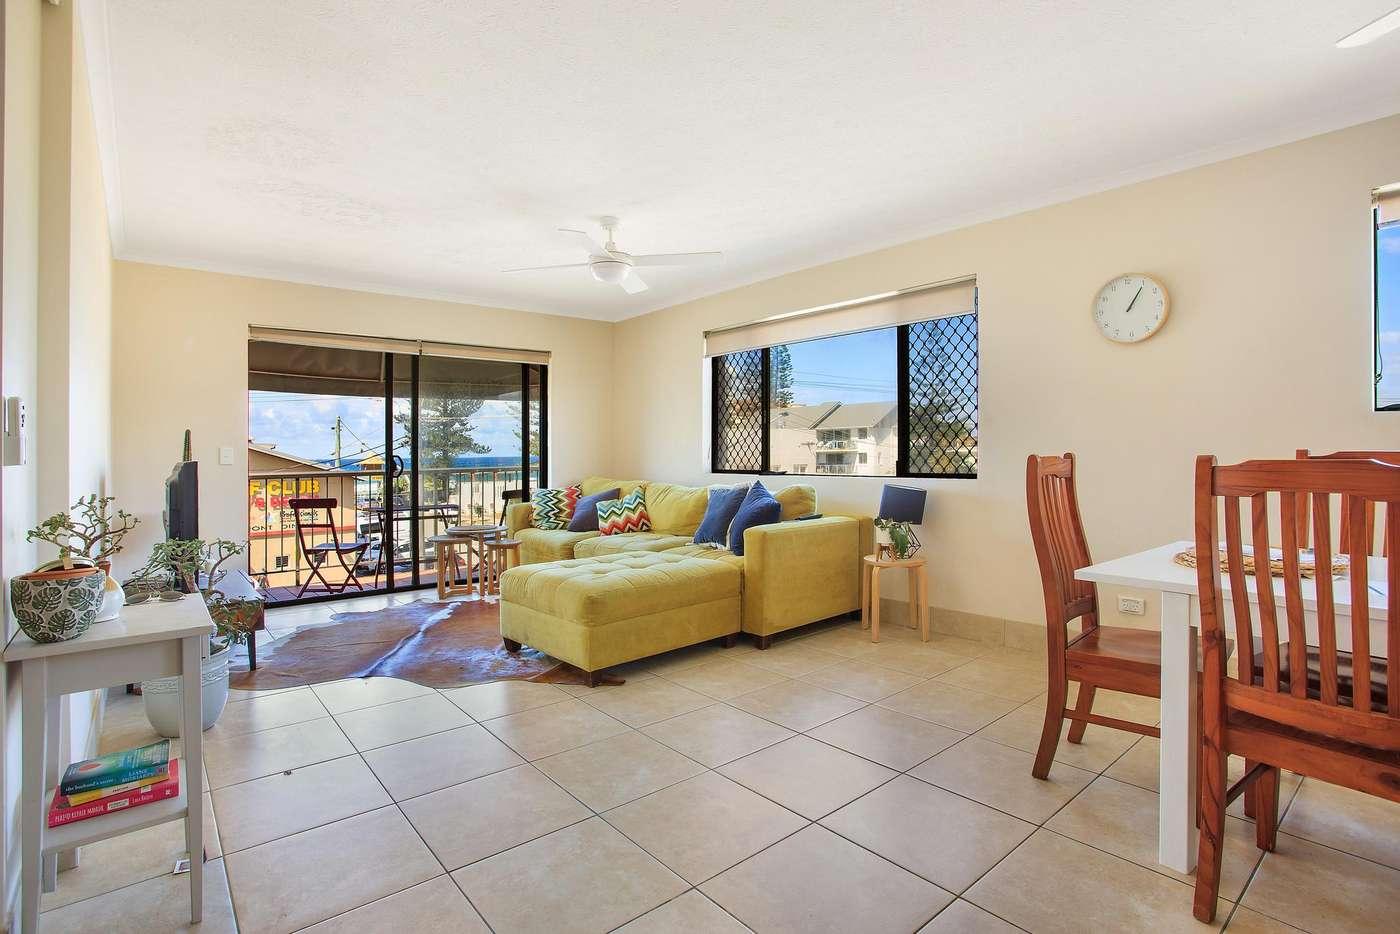 Sixth view of Homely unit listing, 8/26 Albatross Avenue, Mermaid Beach QLD 4218